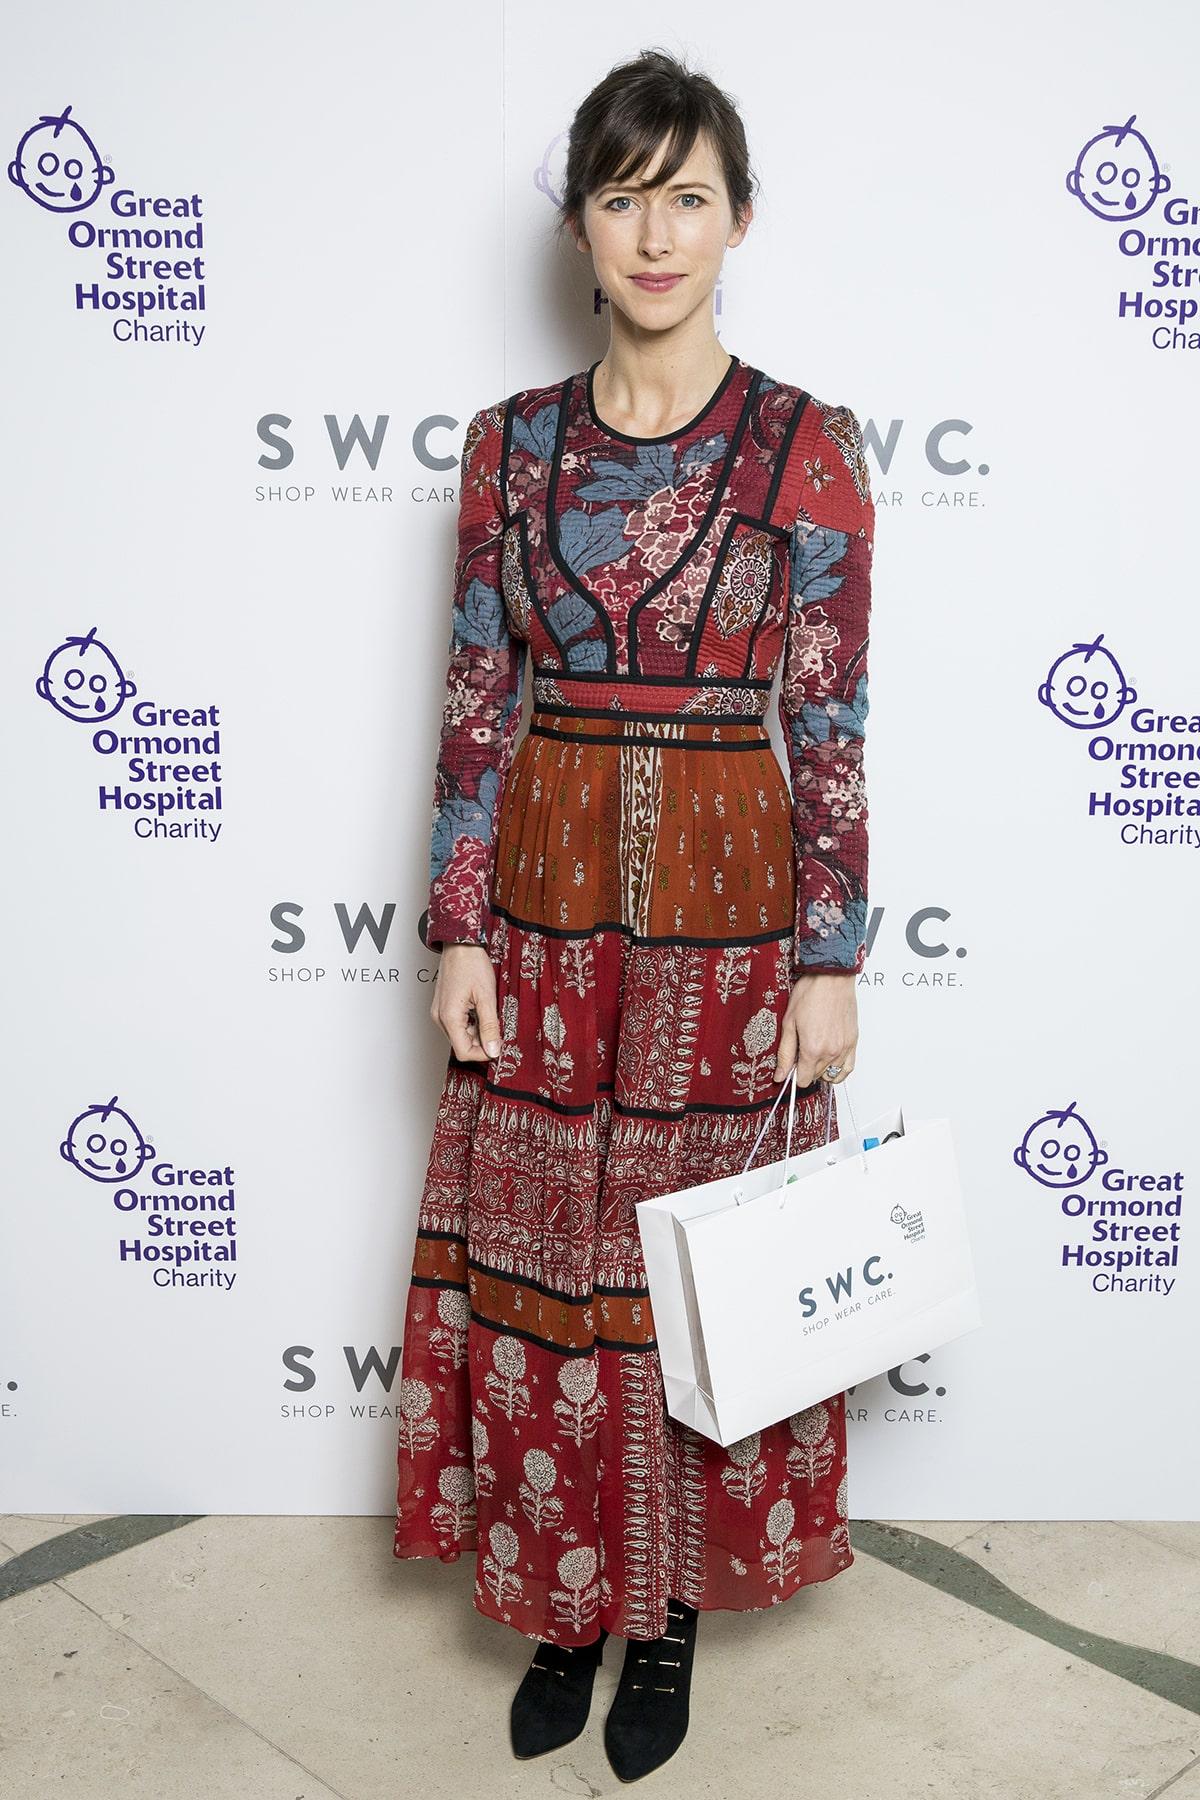 Shop Wear Care at Claridges, London, Britain - 16 Nov 15